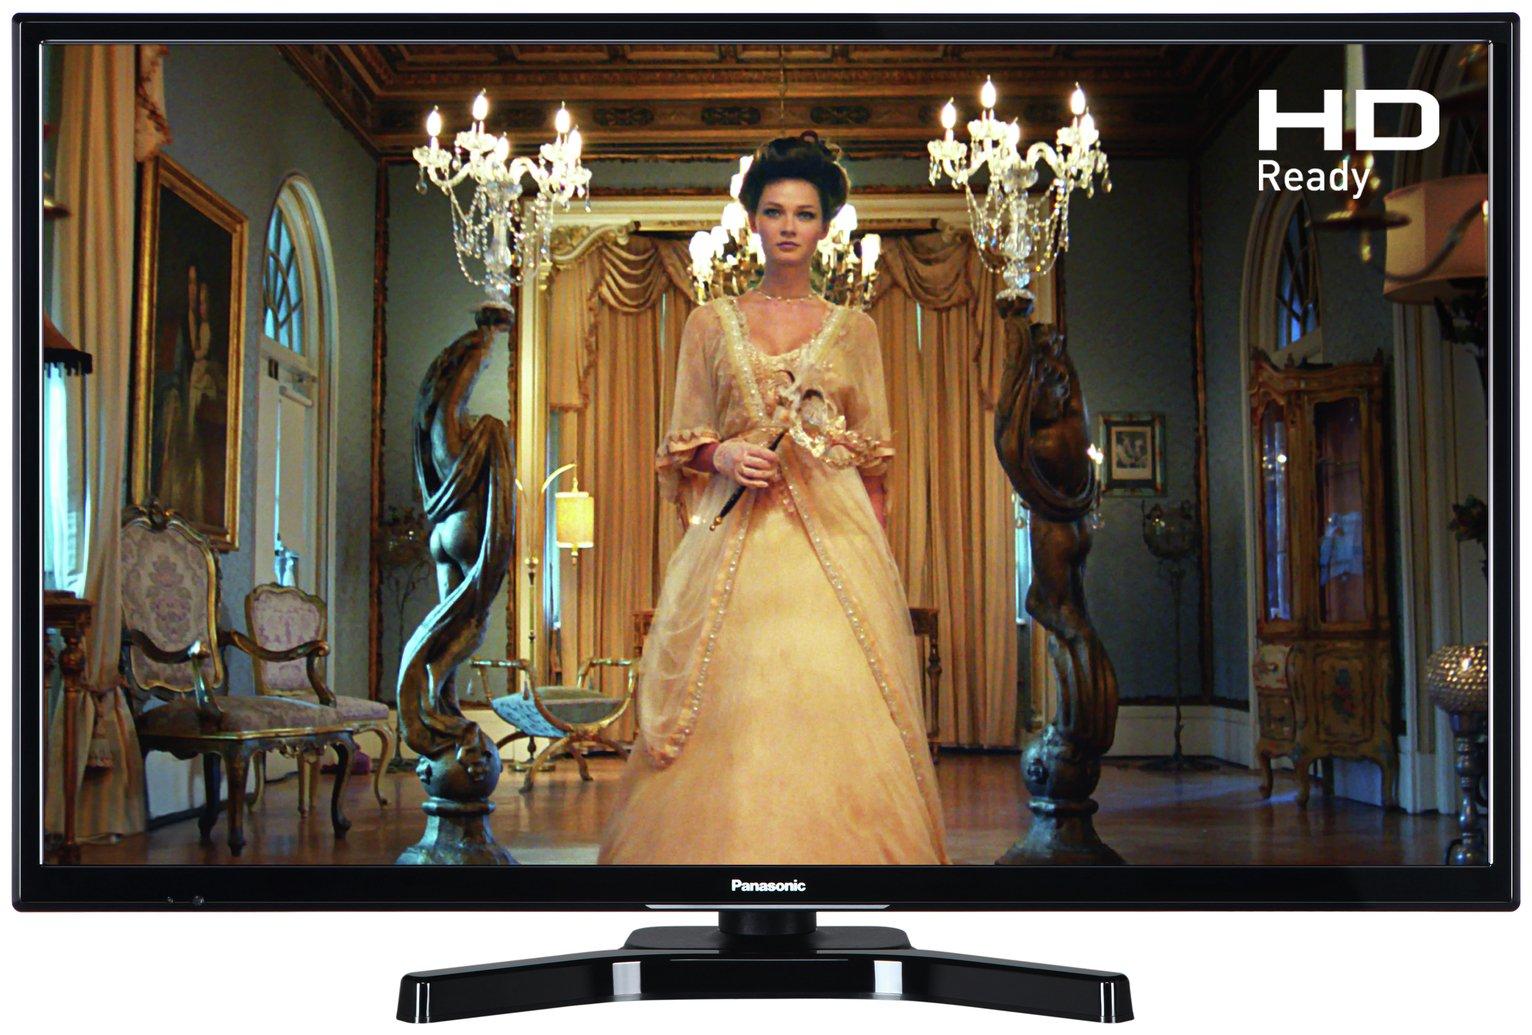 Panasonic 32 Inch 32TX-32E302 HD Ready TV